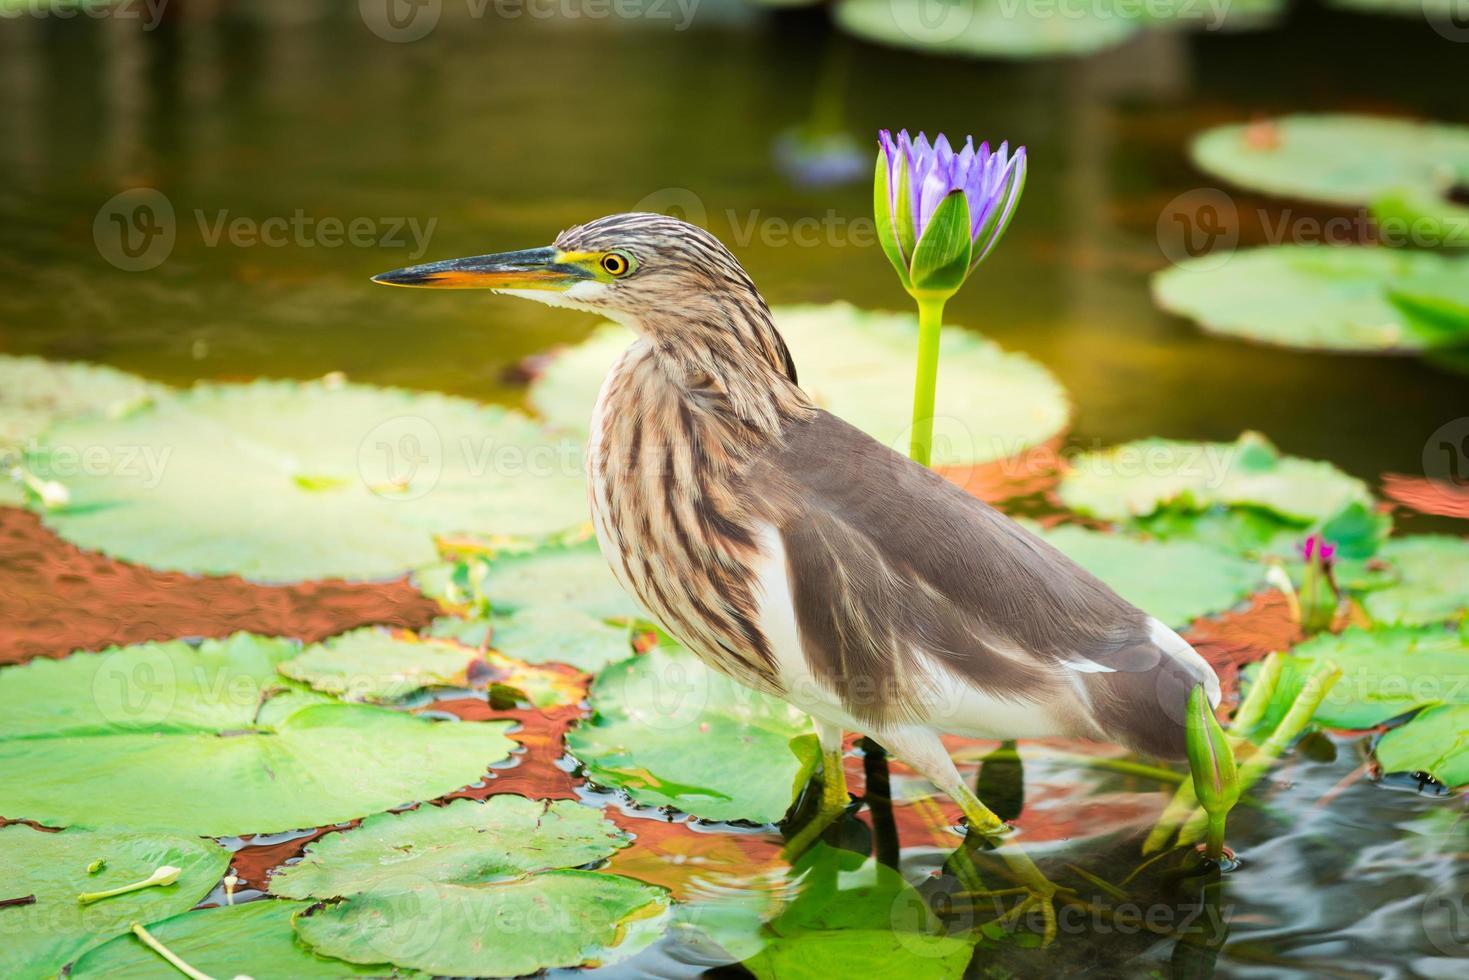 prachtige Javaanse vijverreiger vogel foto